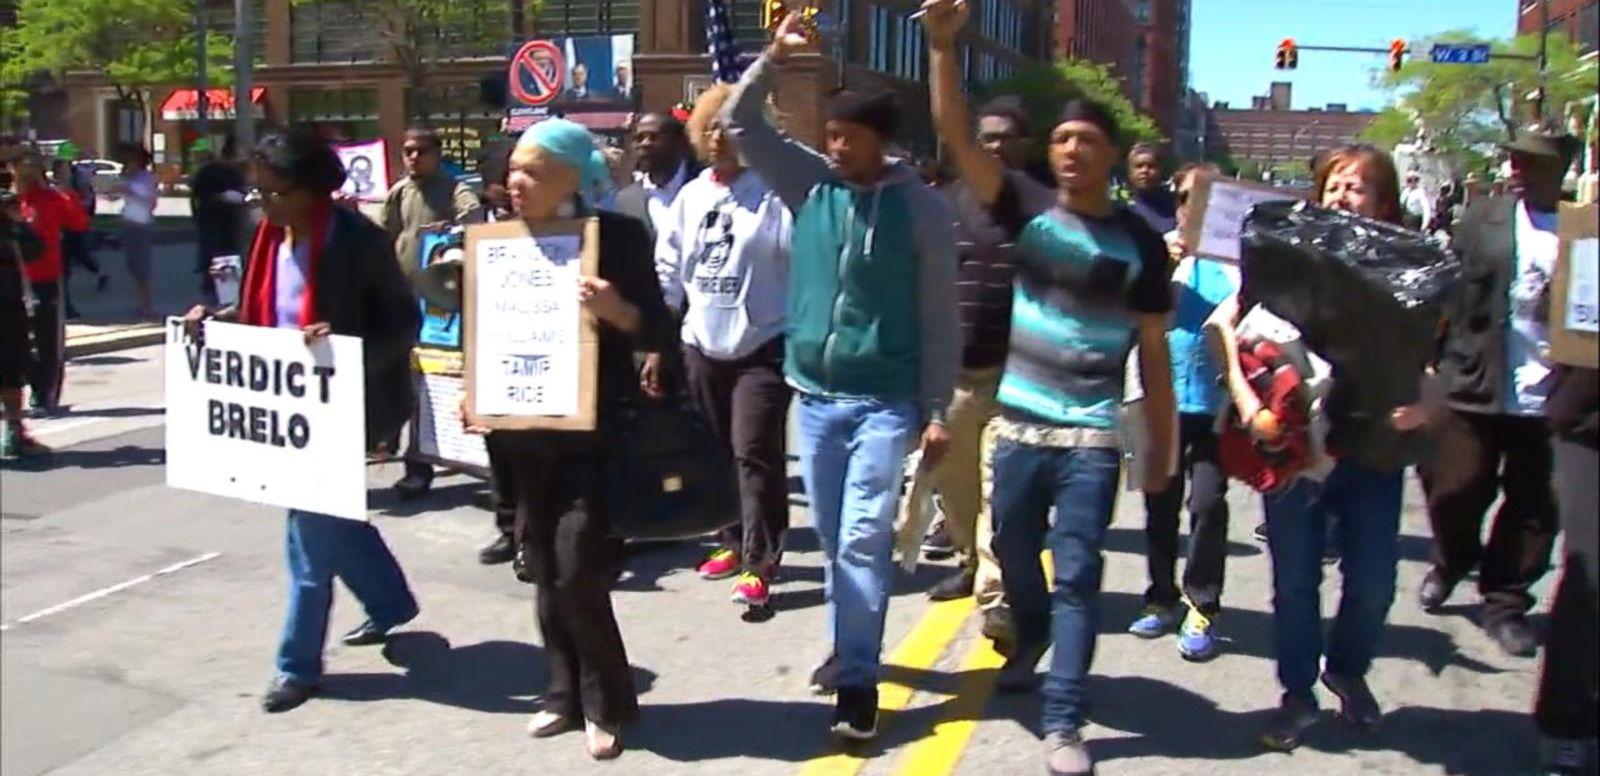 VIDEO: Demonstrators in Cleveland Arrested After Michael Brelo Verdict